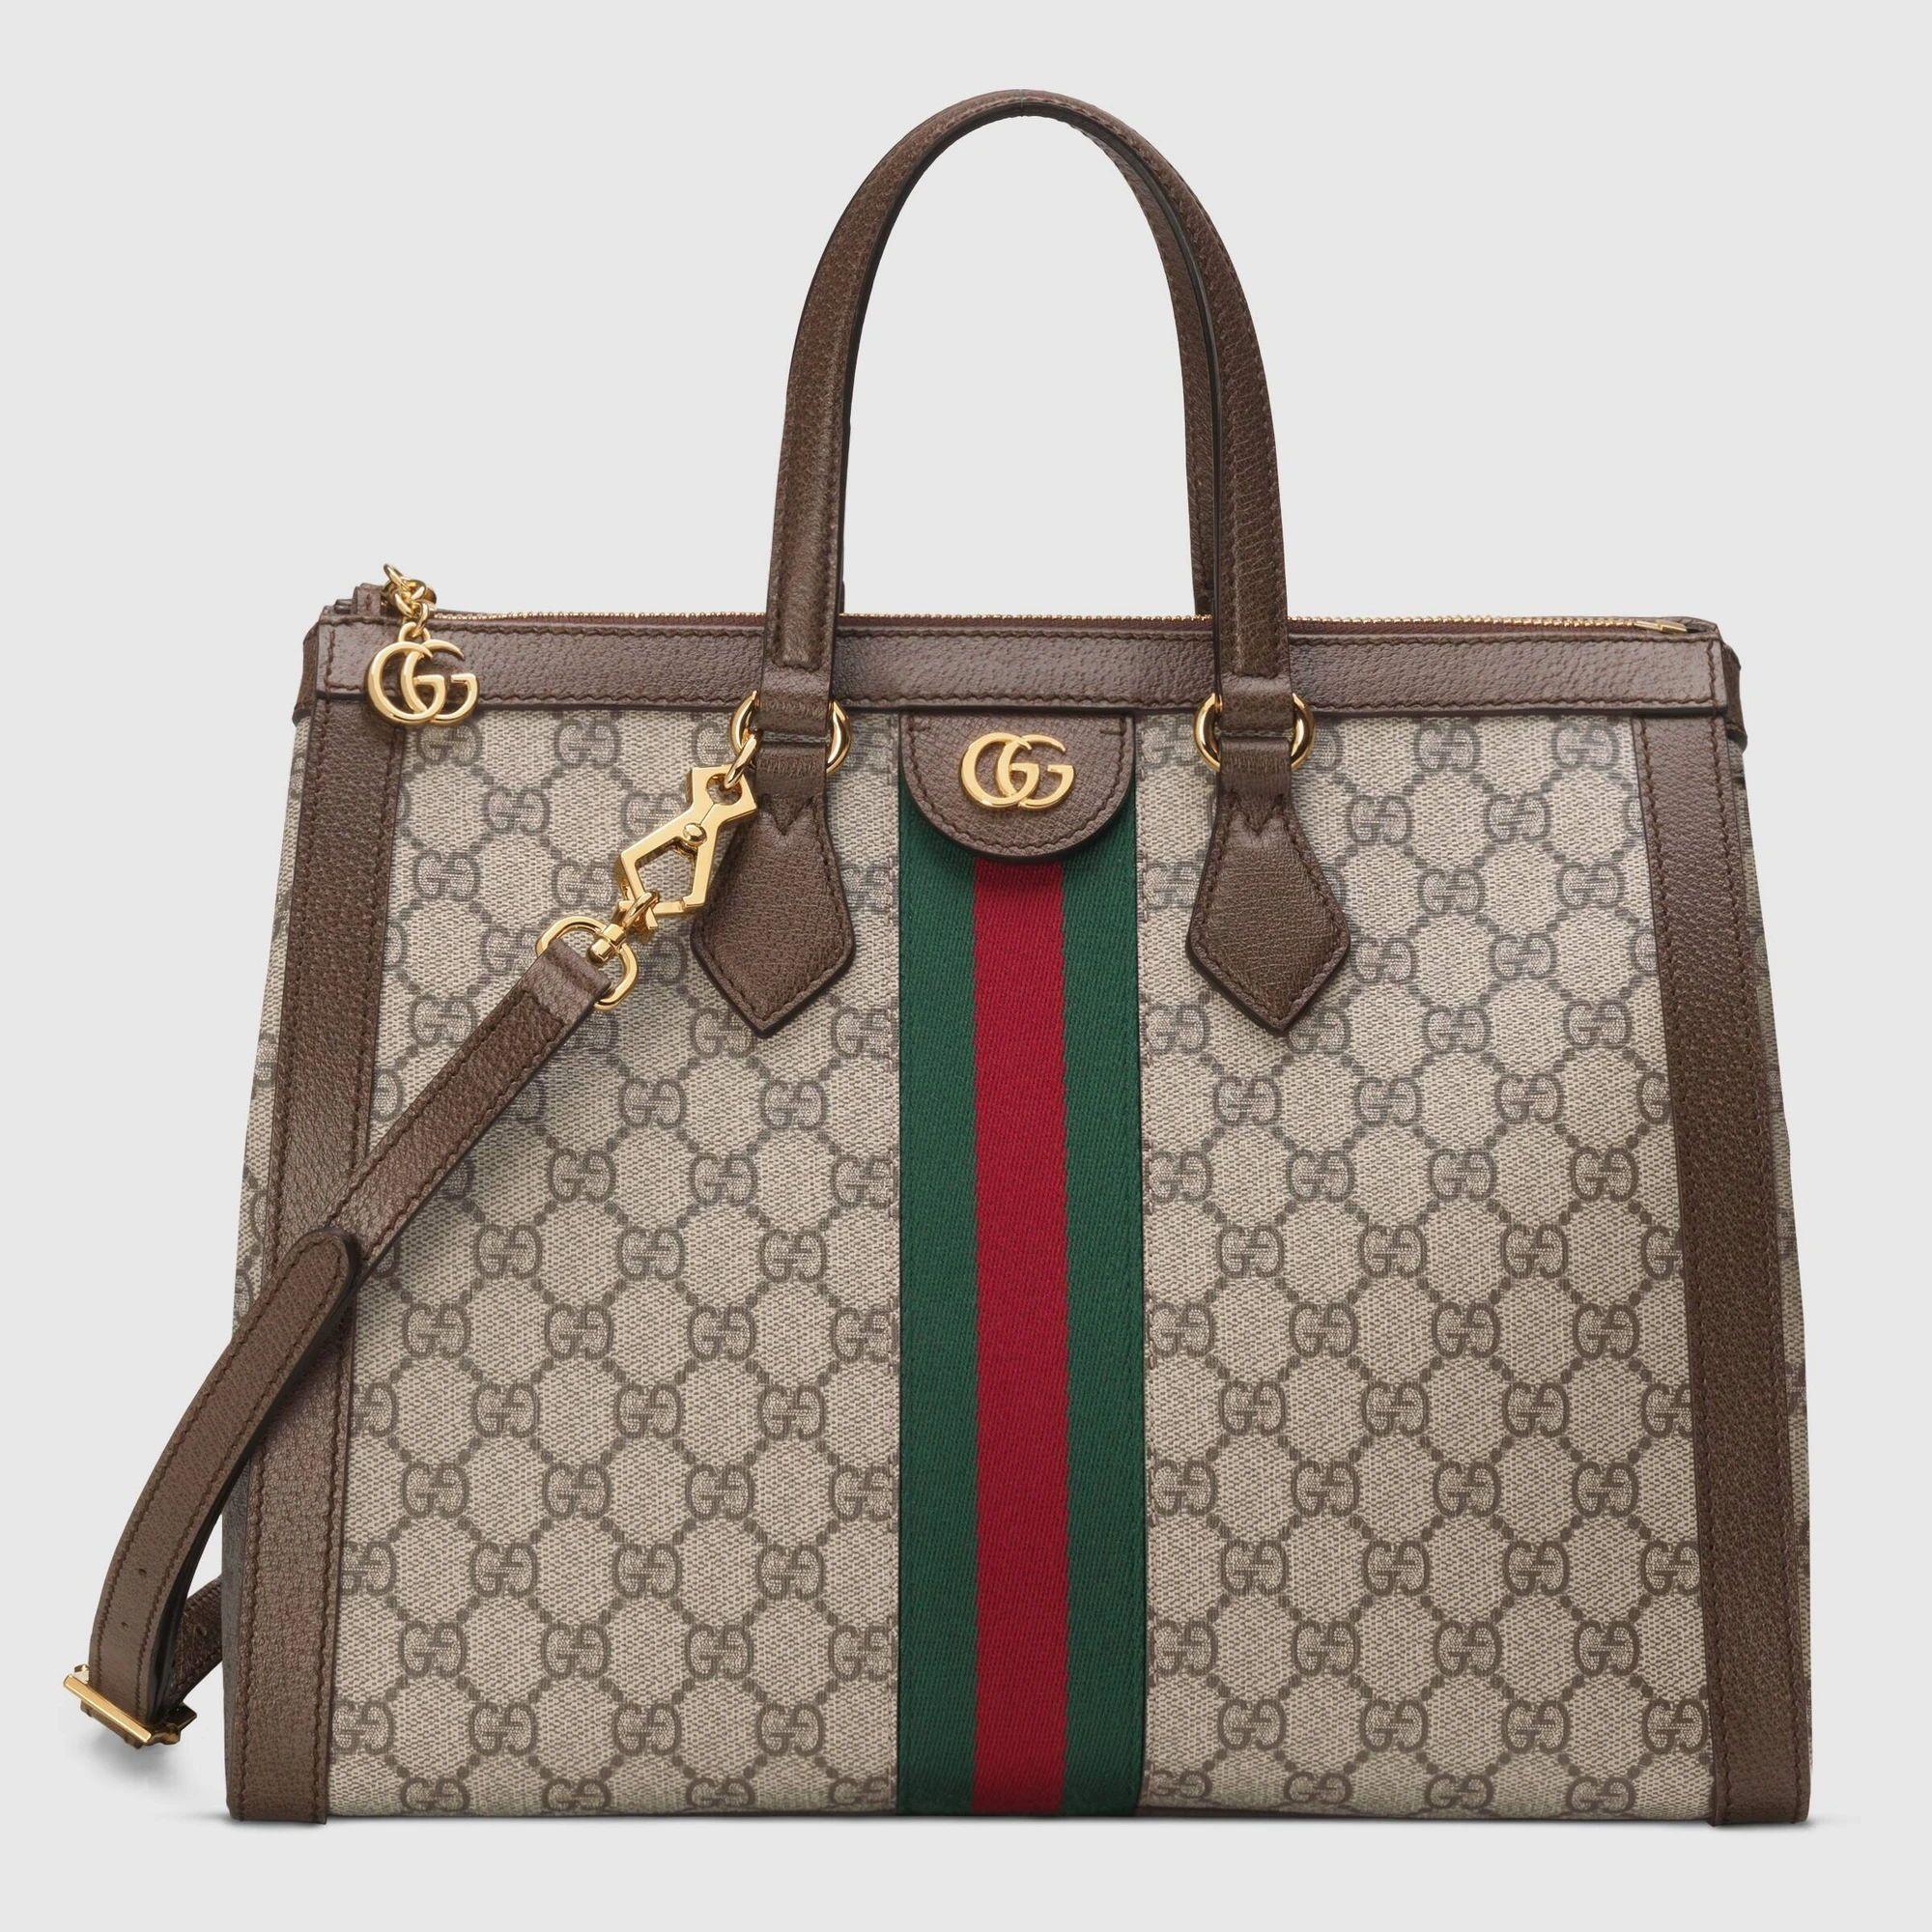 Photo of Gucci Ophidia Medium Tote Bag